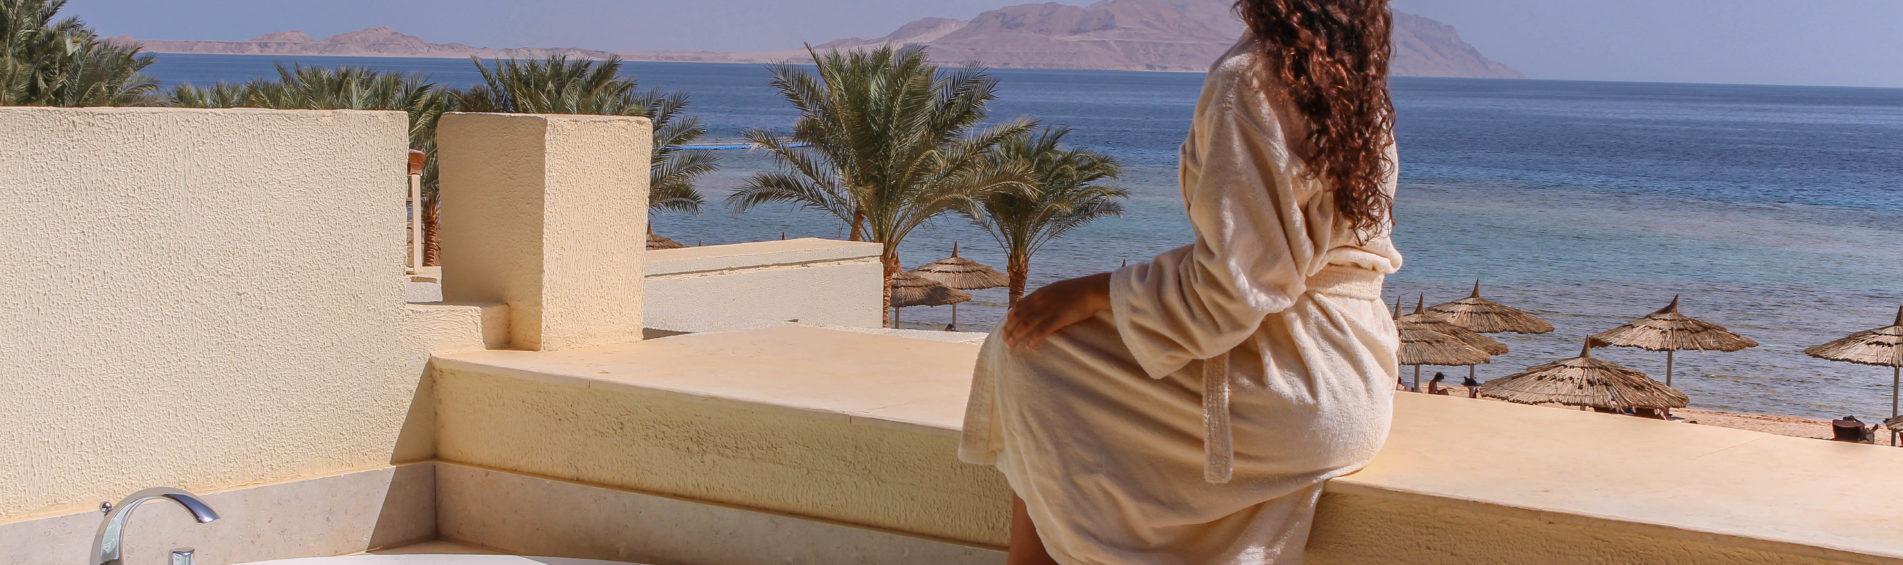 1 semaine au Coral Sea Sensatori Resort à Sharm-el-Sheikh